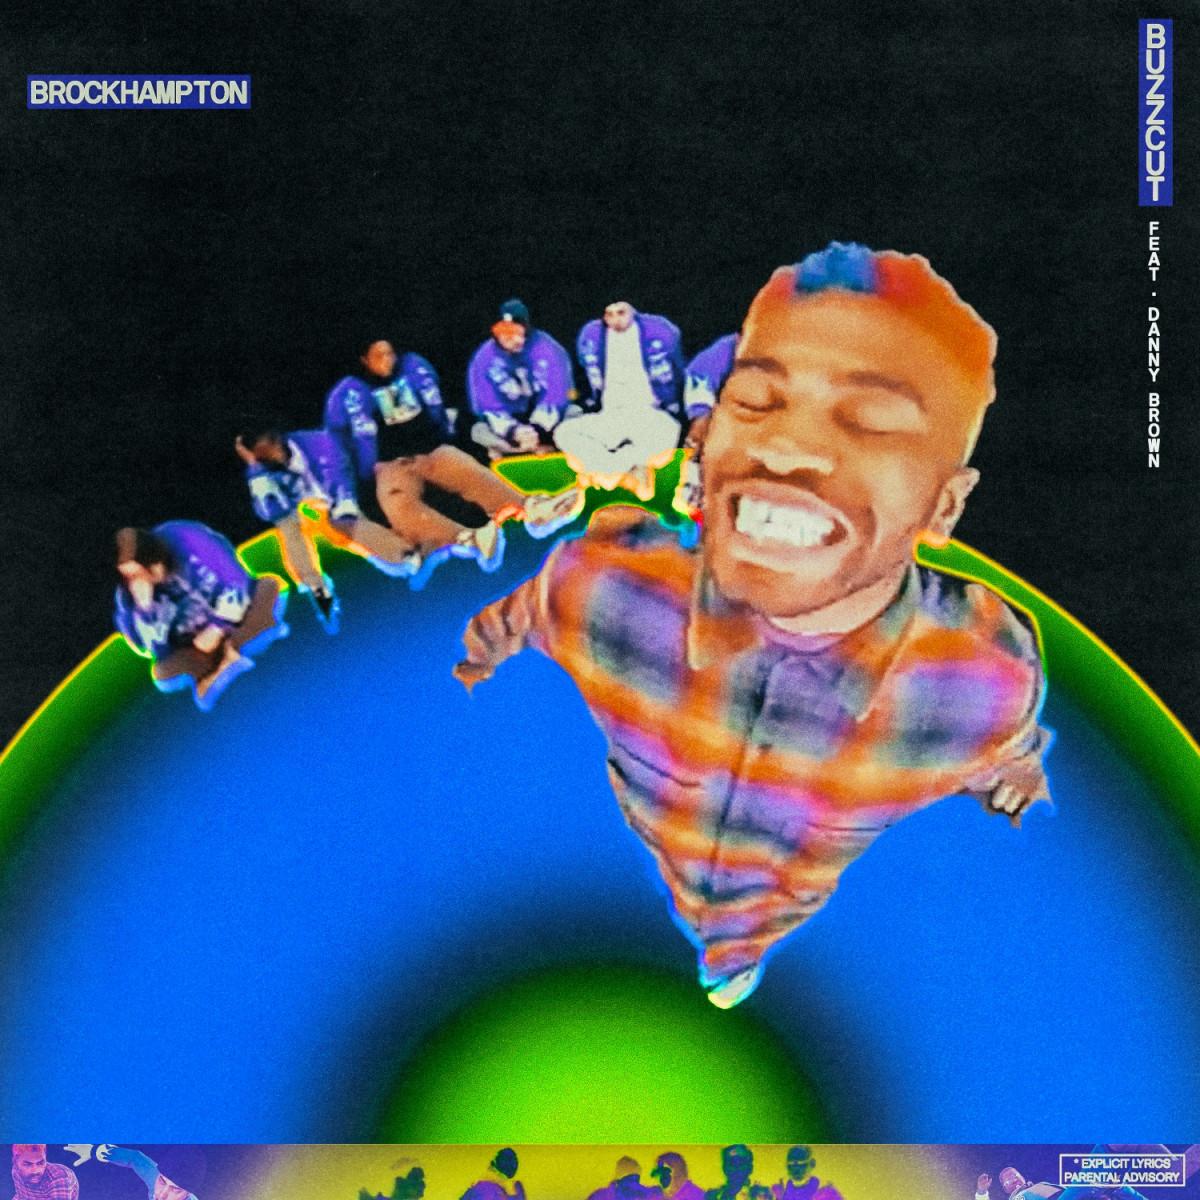 danny brown brockhampton buzzcut cover art poster 2021